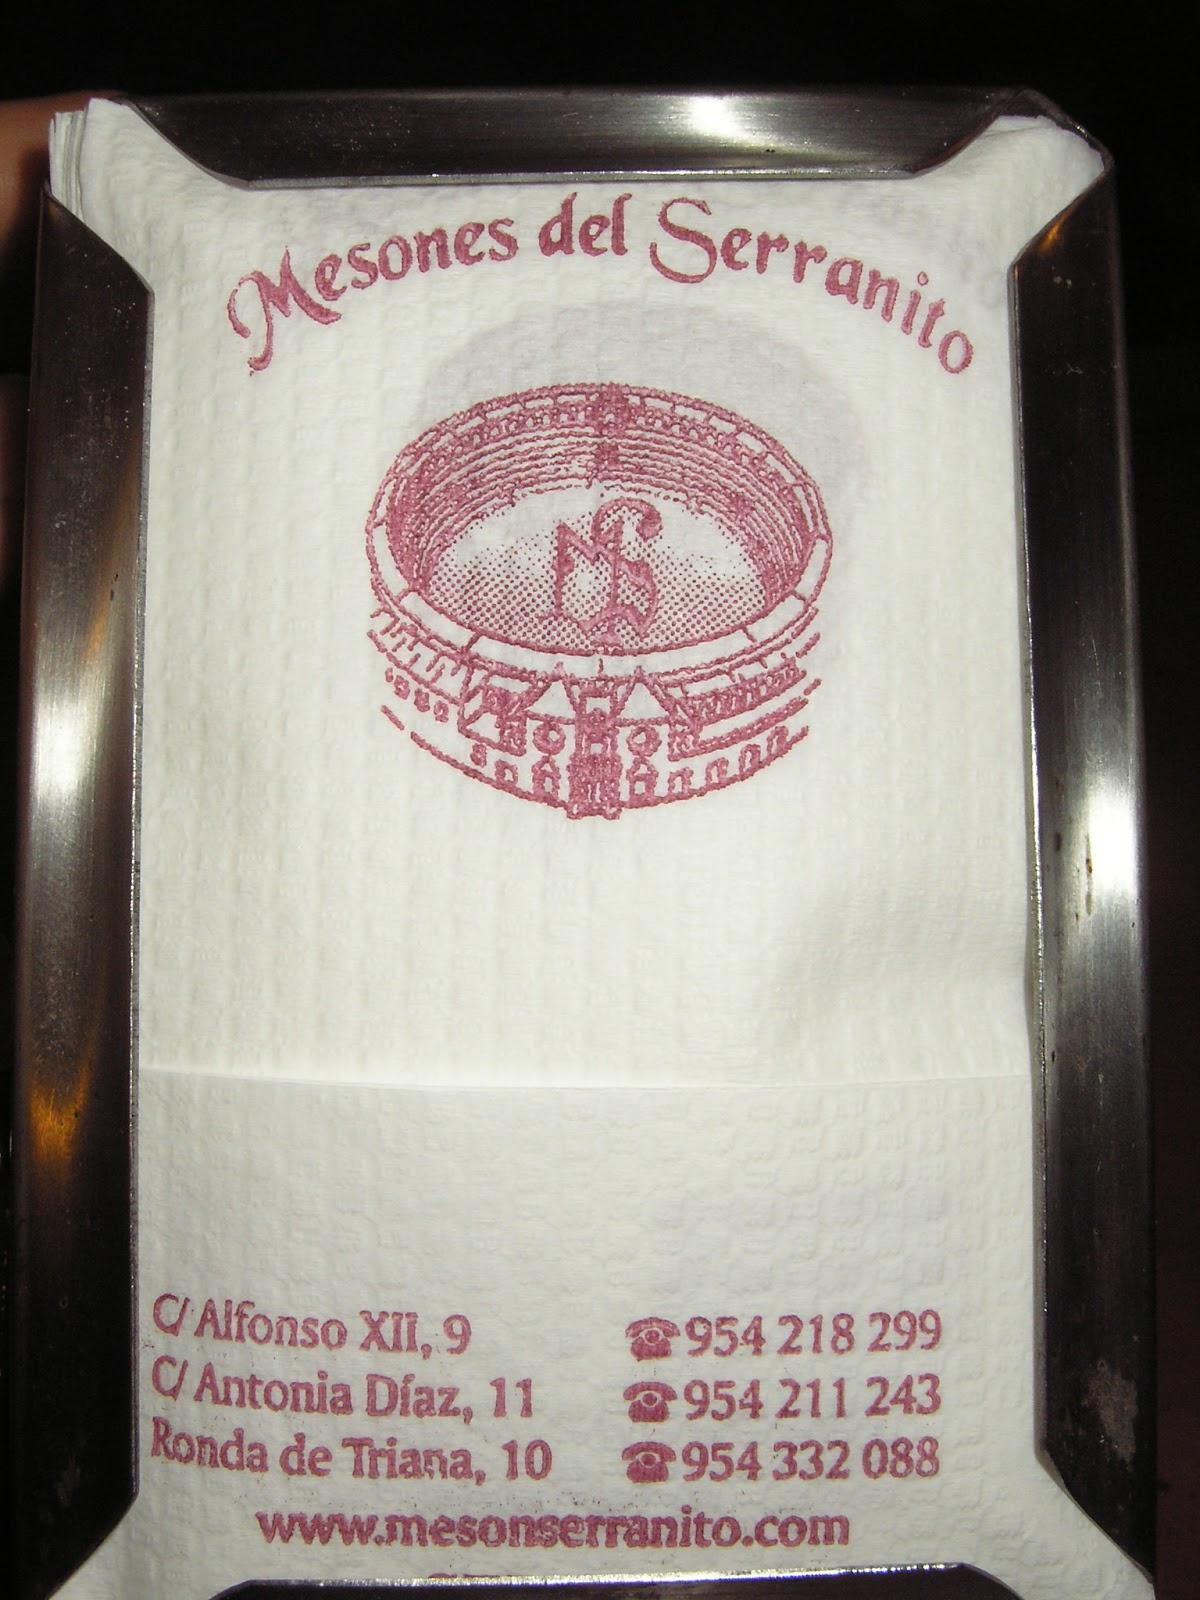 Datos Mesón Serranito, Serranito Advisor